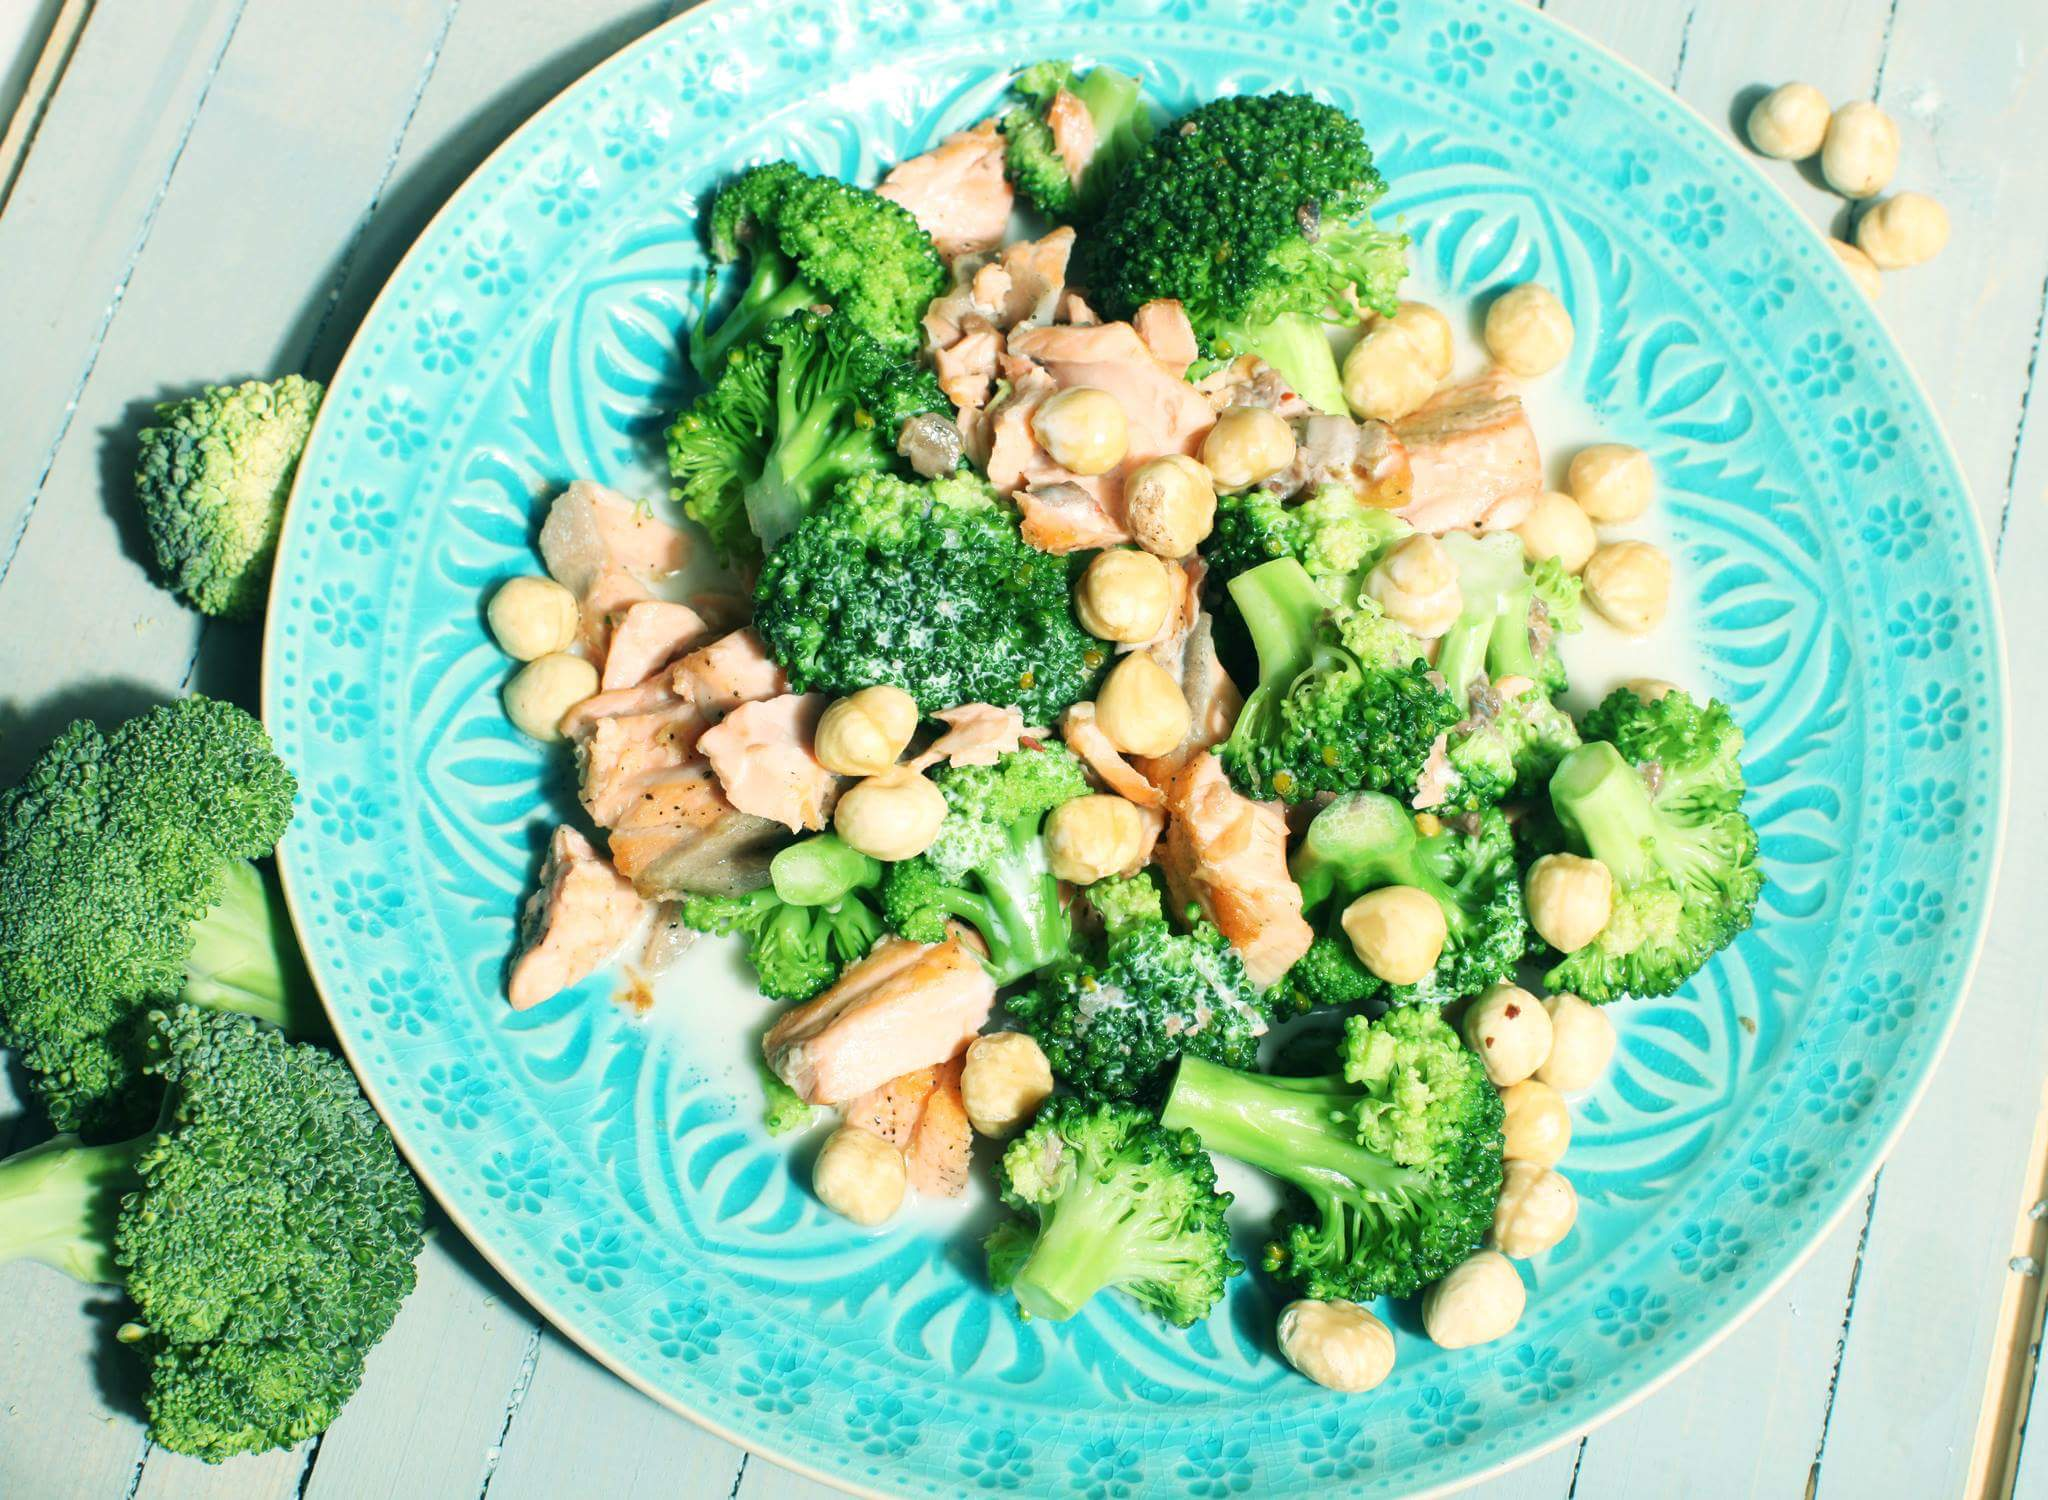 Салат из брокколи с лососем, фундуком и йогуртом